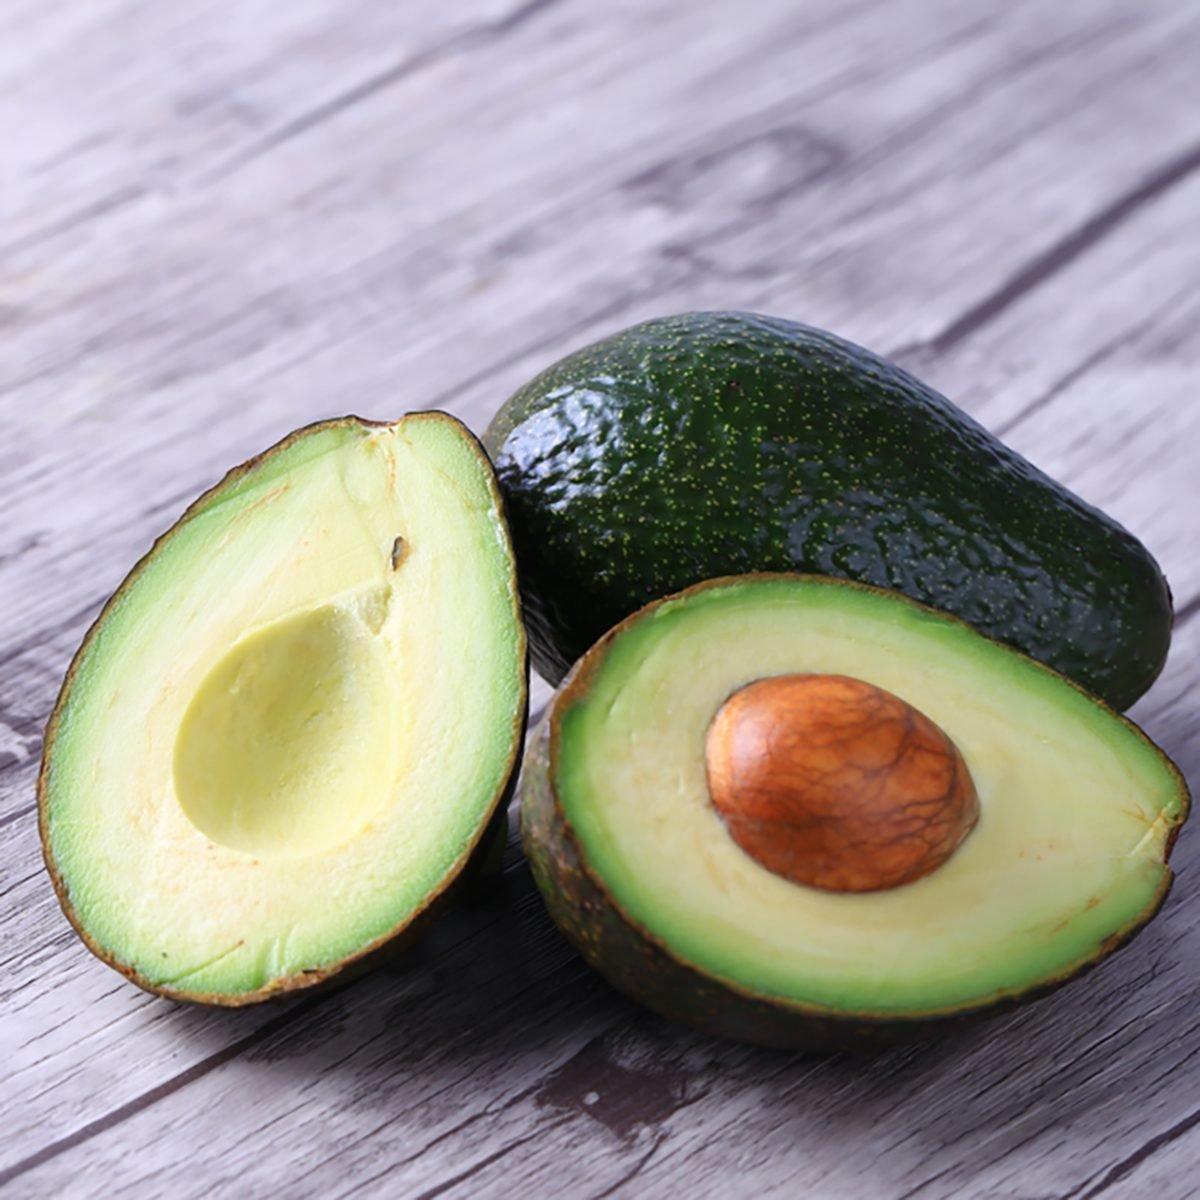 Fresh avocado on a wooden table